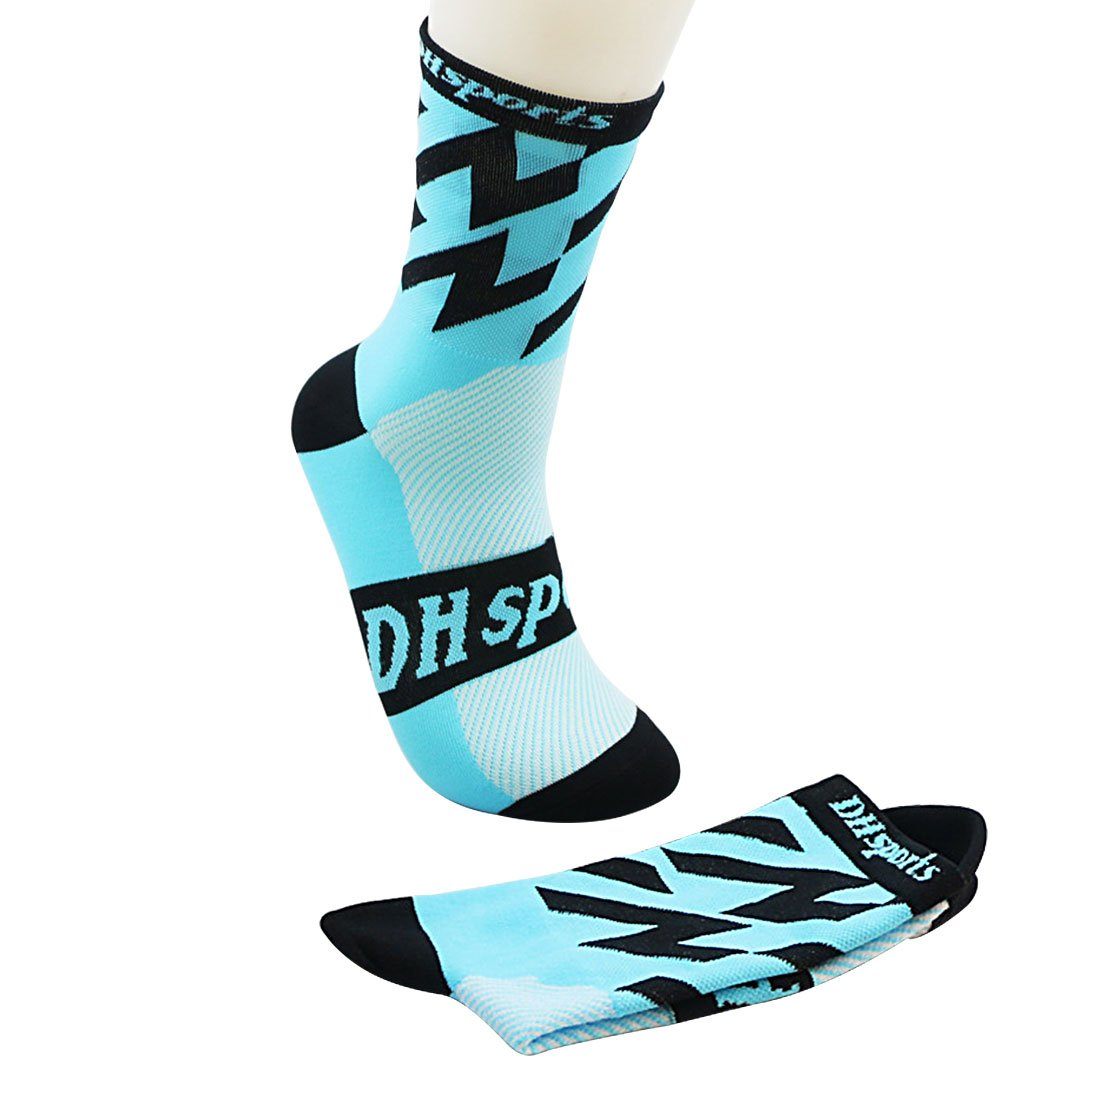 YAMALL Riding Cycling Socks Bicycle Sports Socks Breathable Long Socks Men Women iHen-Tech